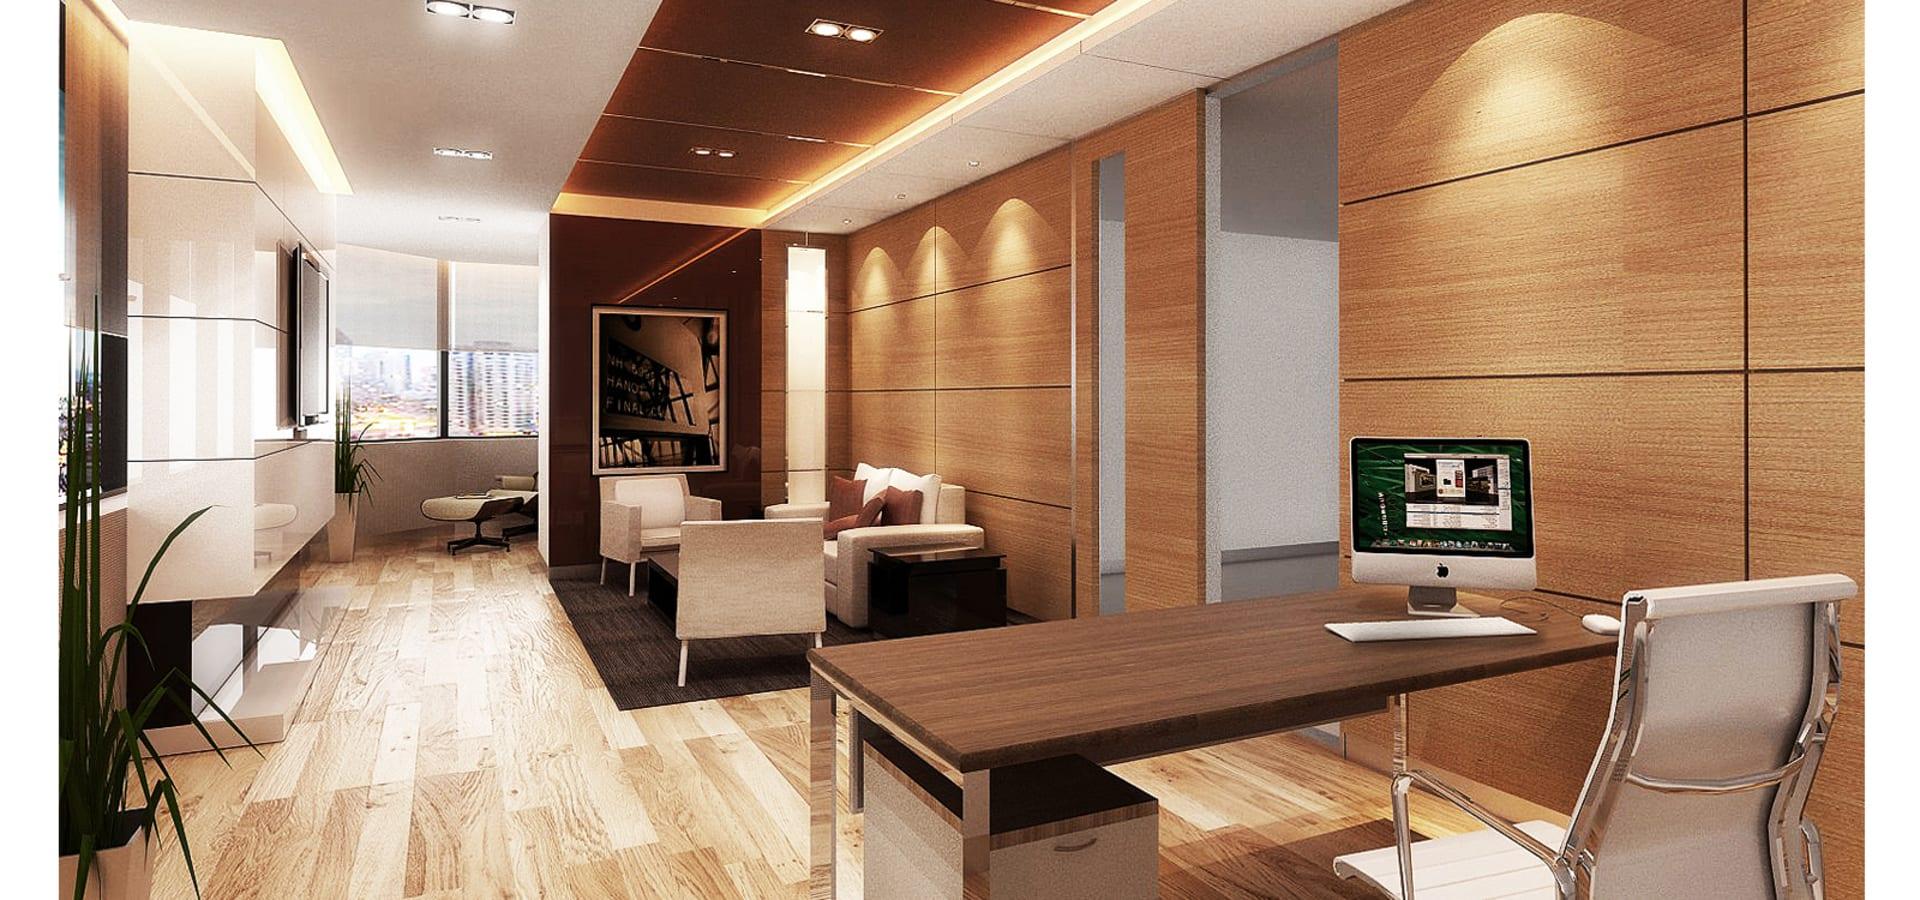 Interior Design : Persona Office Design | homify